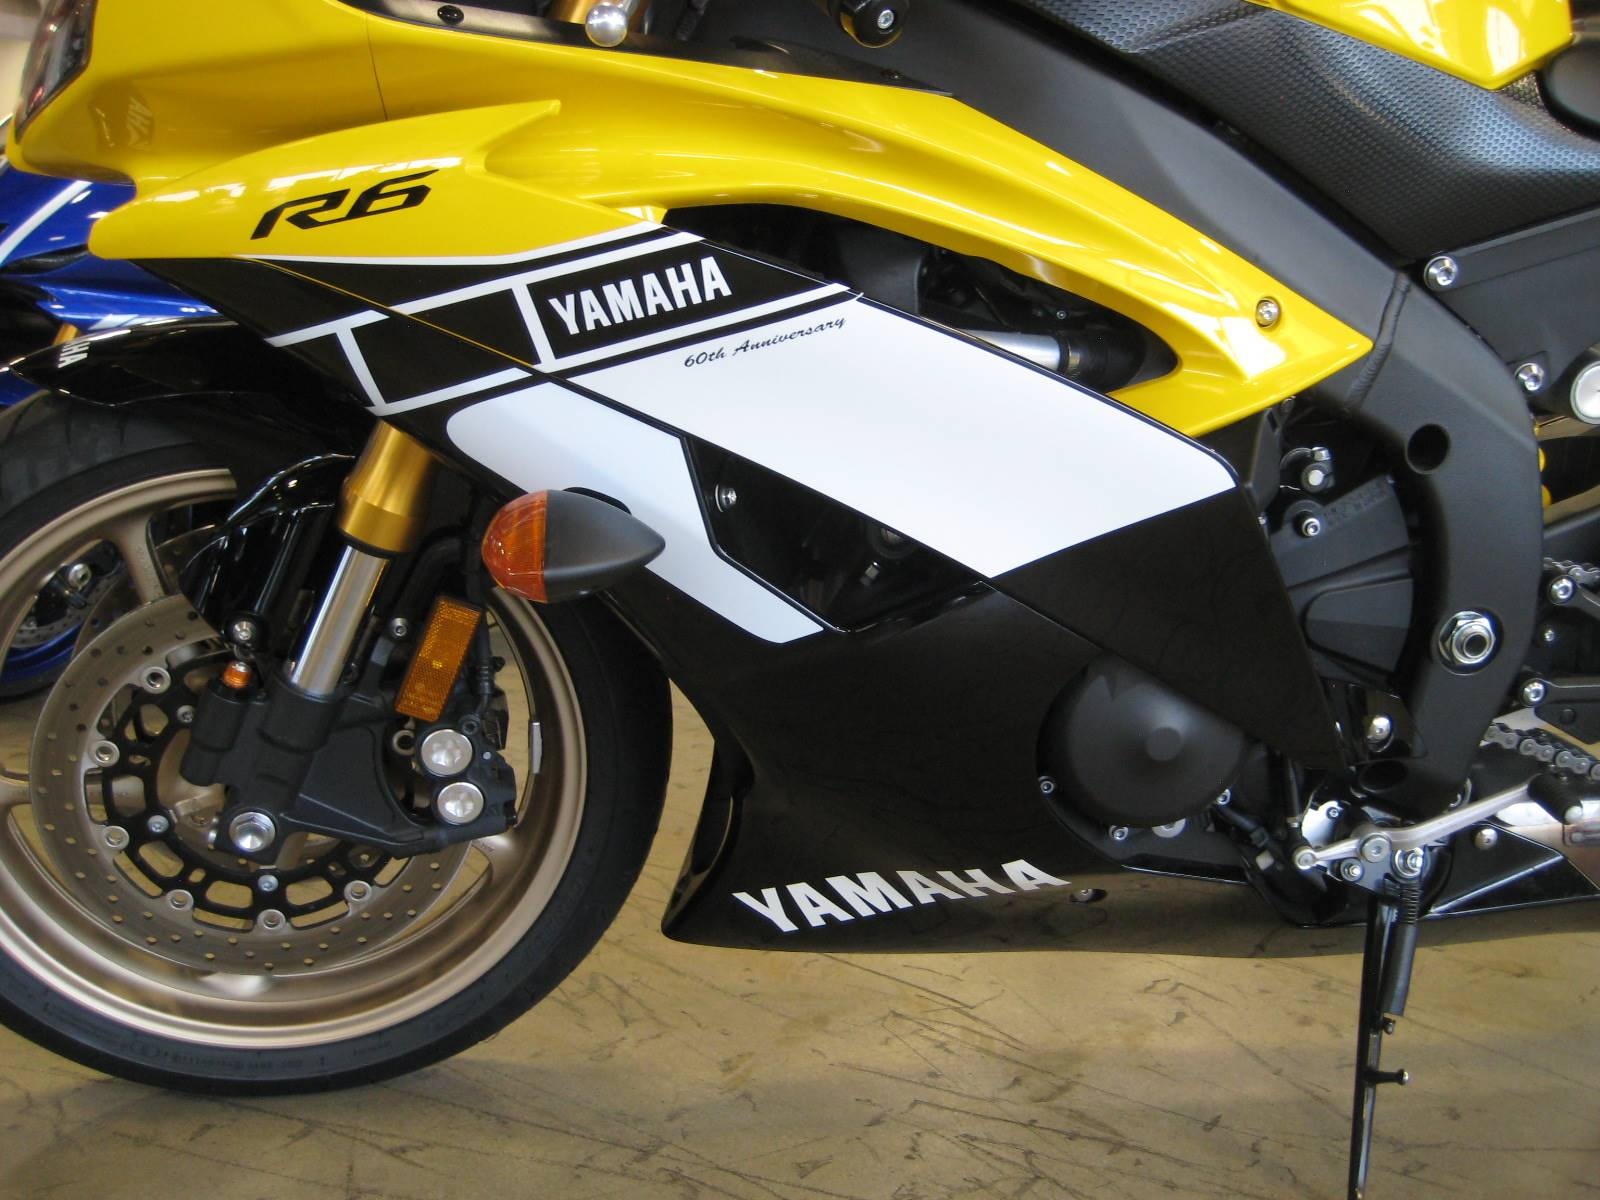 2016 Yamaha YZF-R6 11